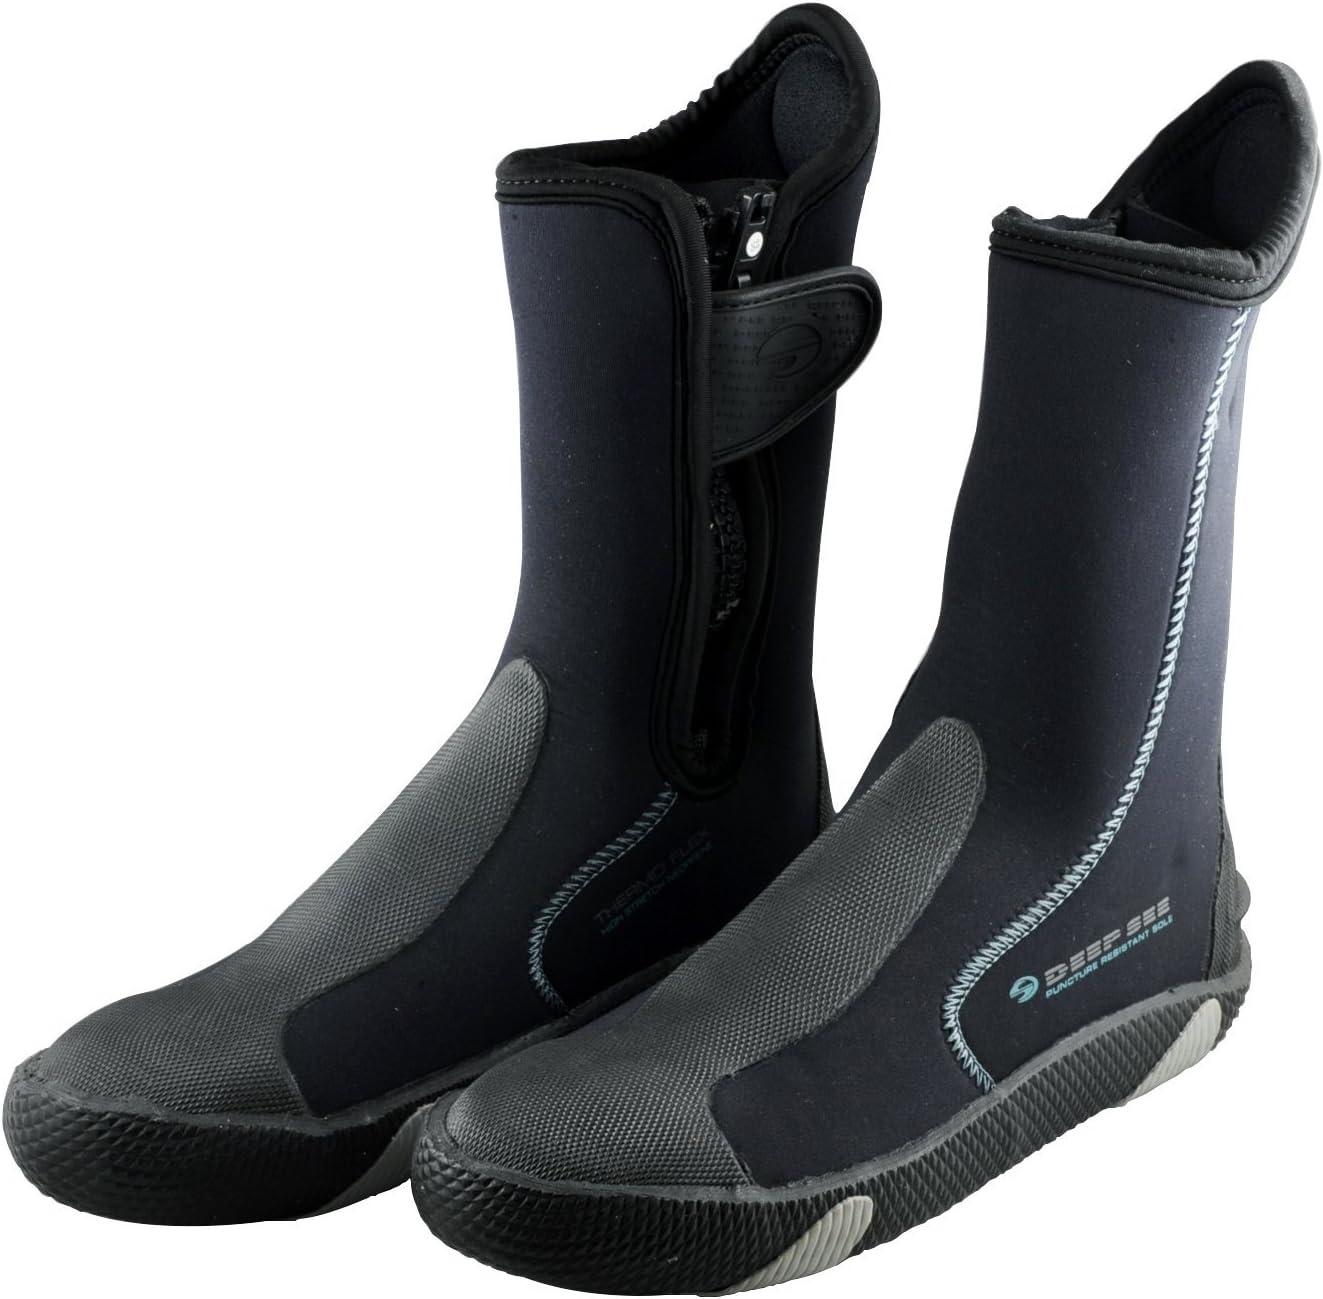 Deep See Man Safe Sole Boots-5 Latest item Dive Save money 5mm Zipper